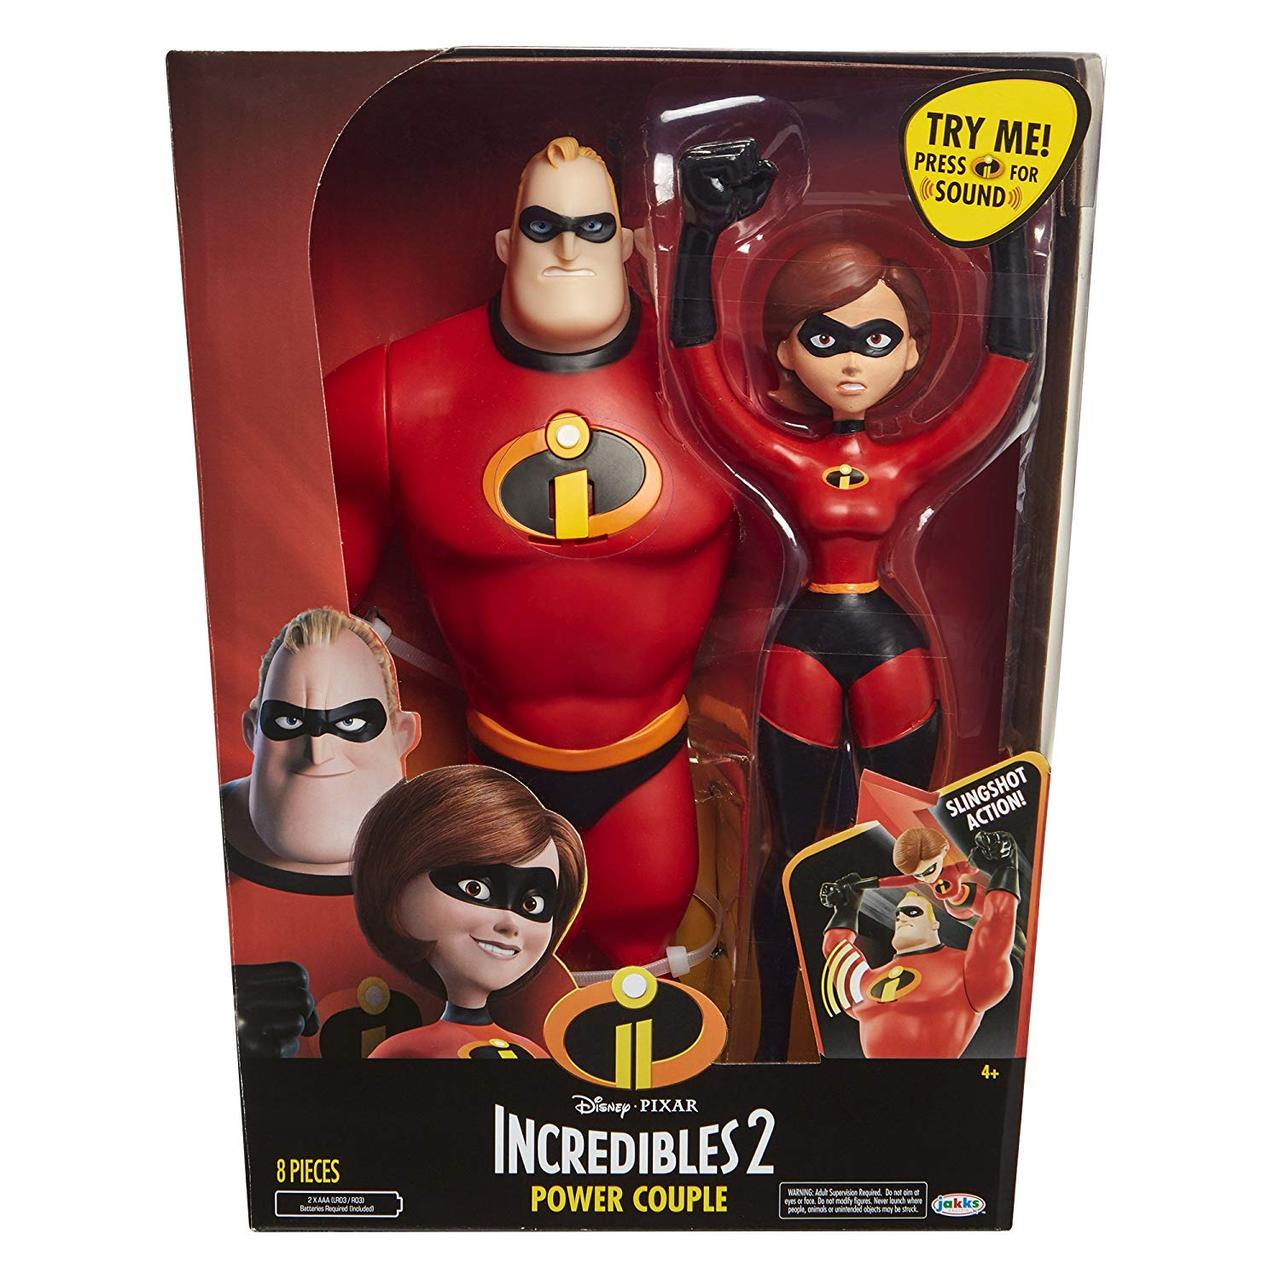 Набор Супер Семейка Мощная пара 30см, Incredibles, Power Couple Mr. Incredible and Elastigirl, Оригинал из США